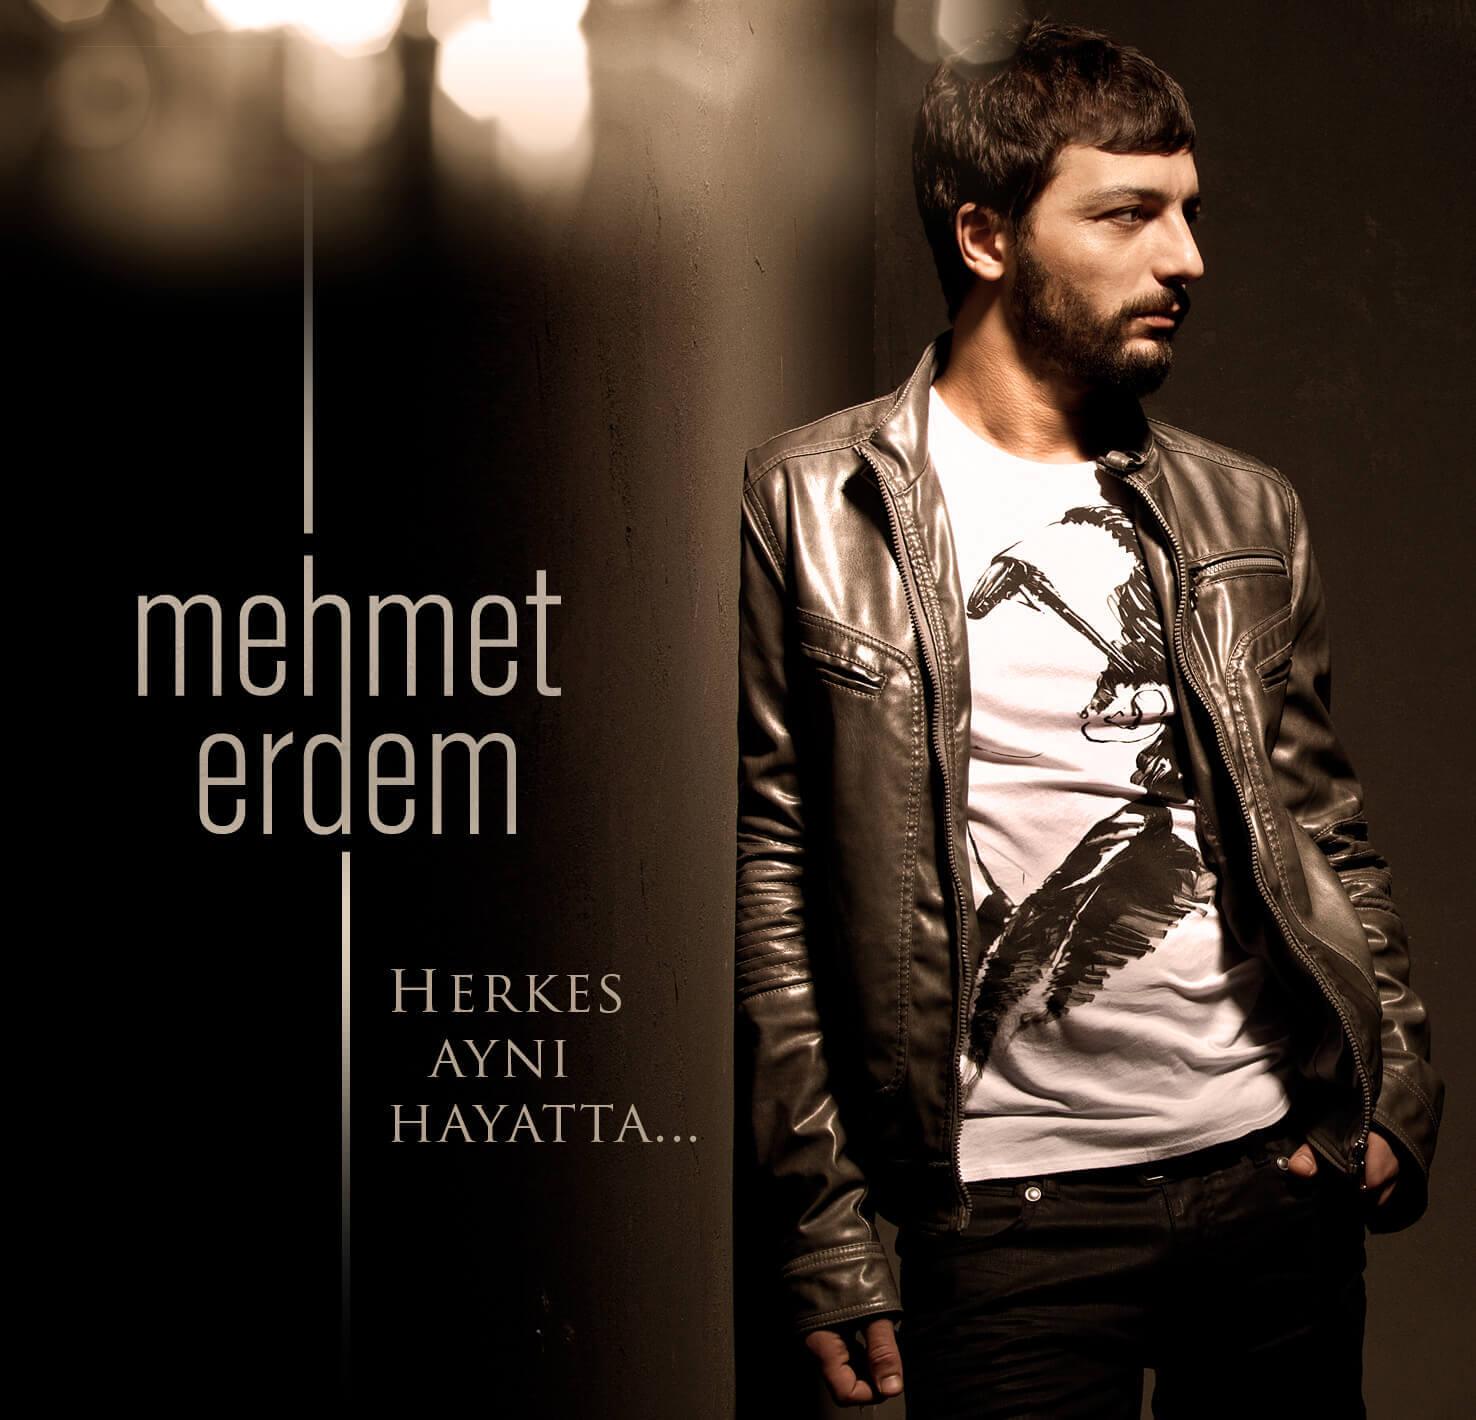 ask-ve-gurur-herkes-ayni-hayatta-ft-mehmet-erdem(musicafee.com) دانلود آهنگ